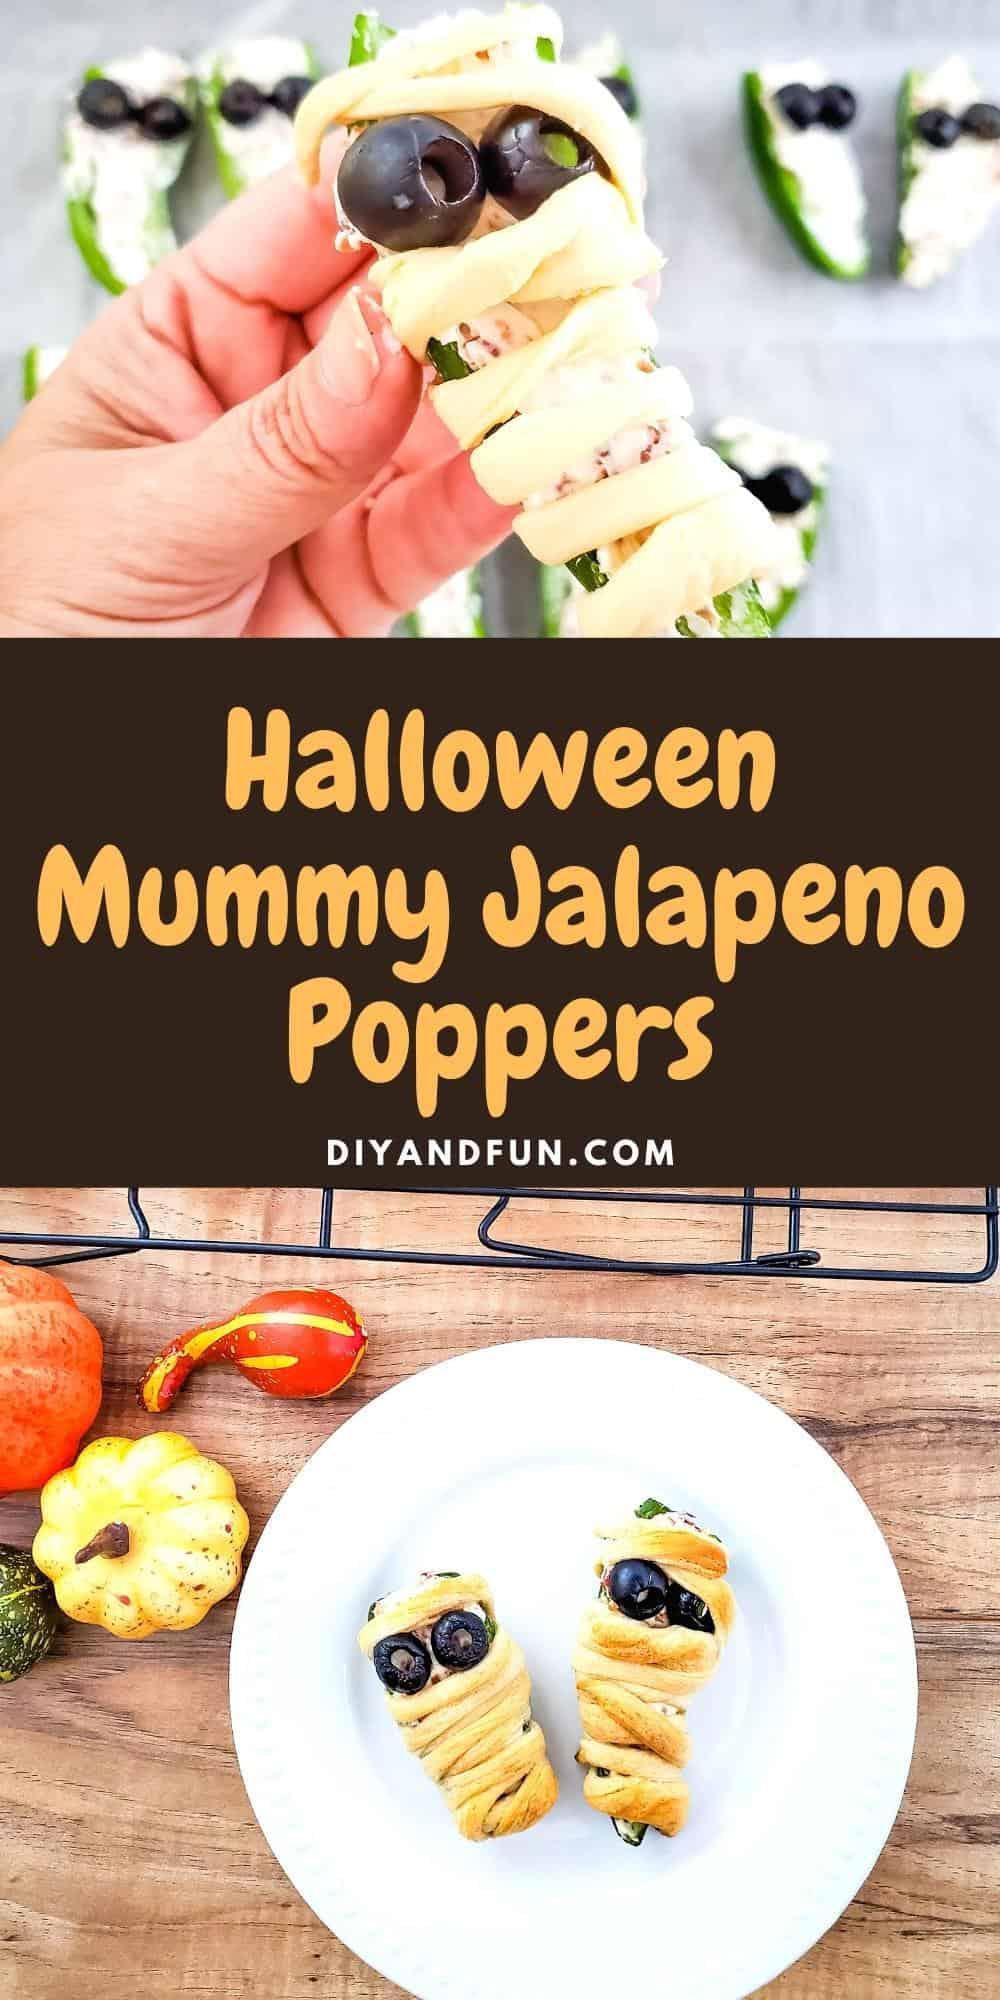 Easy Mummy Jalapeno Poppers